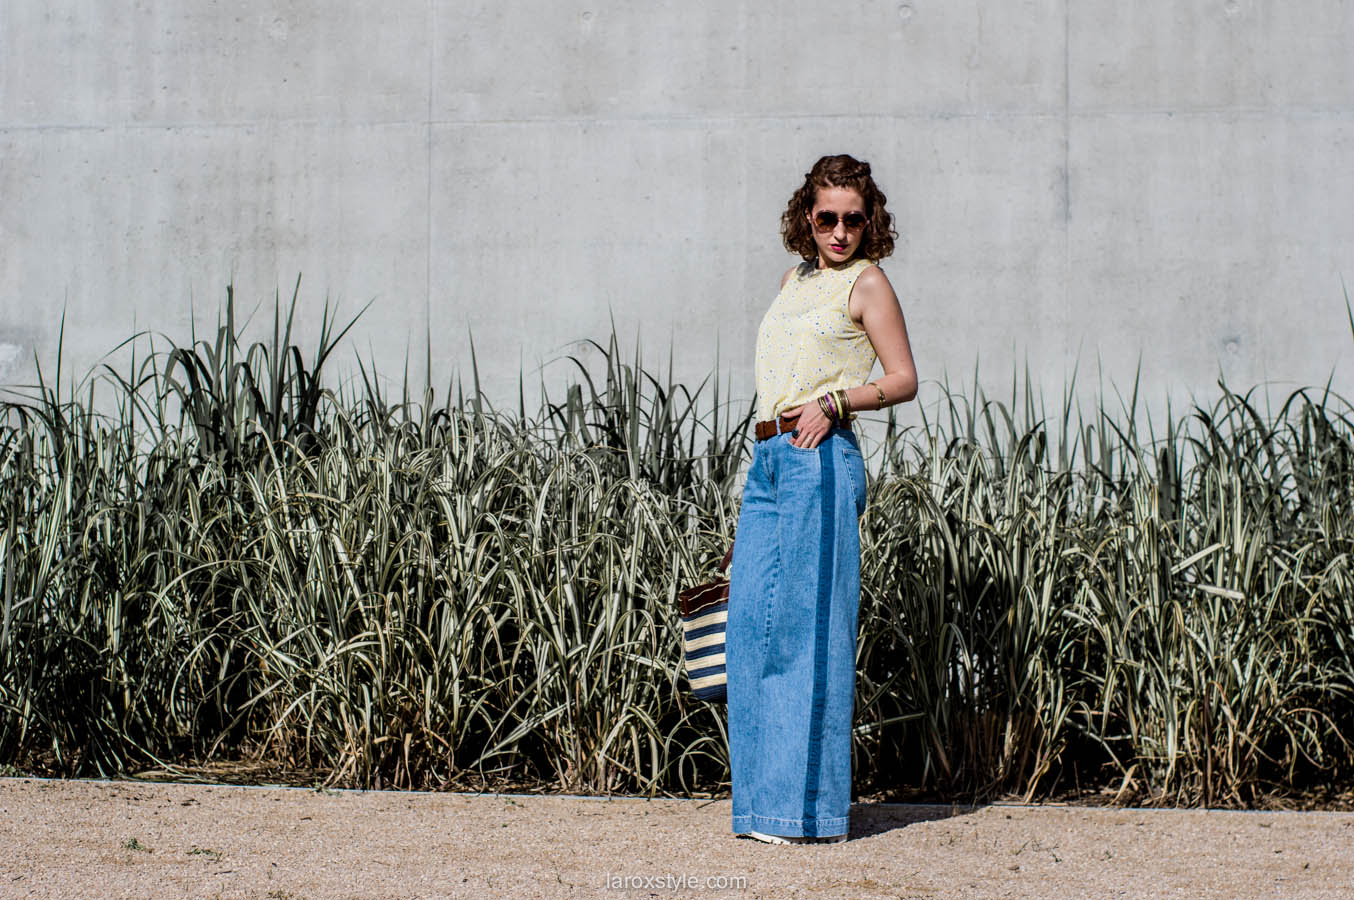 laroxstyle - blog mode lyon - look 70s - pantalon patte d elephant (15 sur 44)